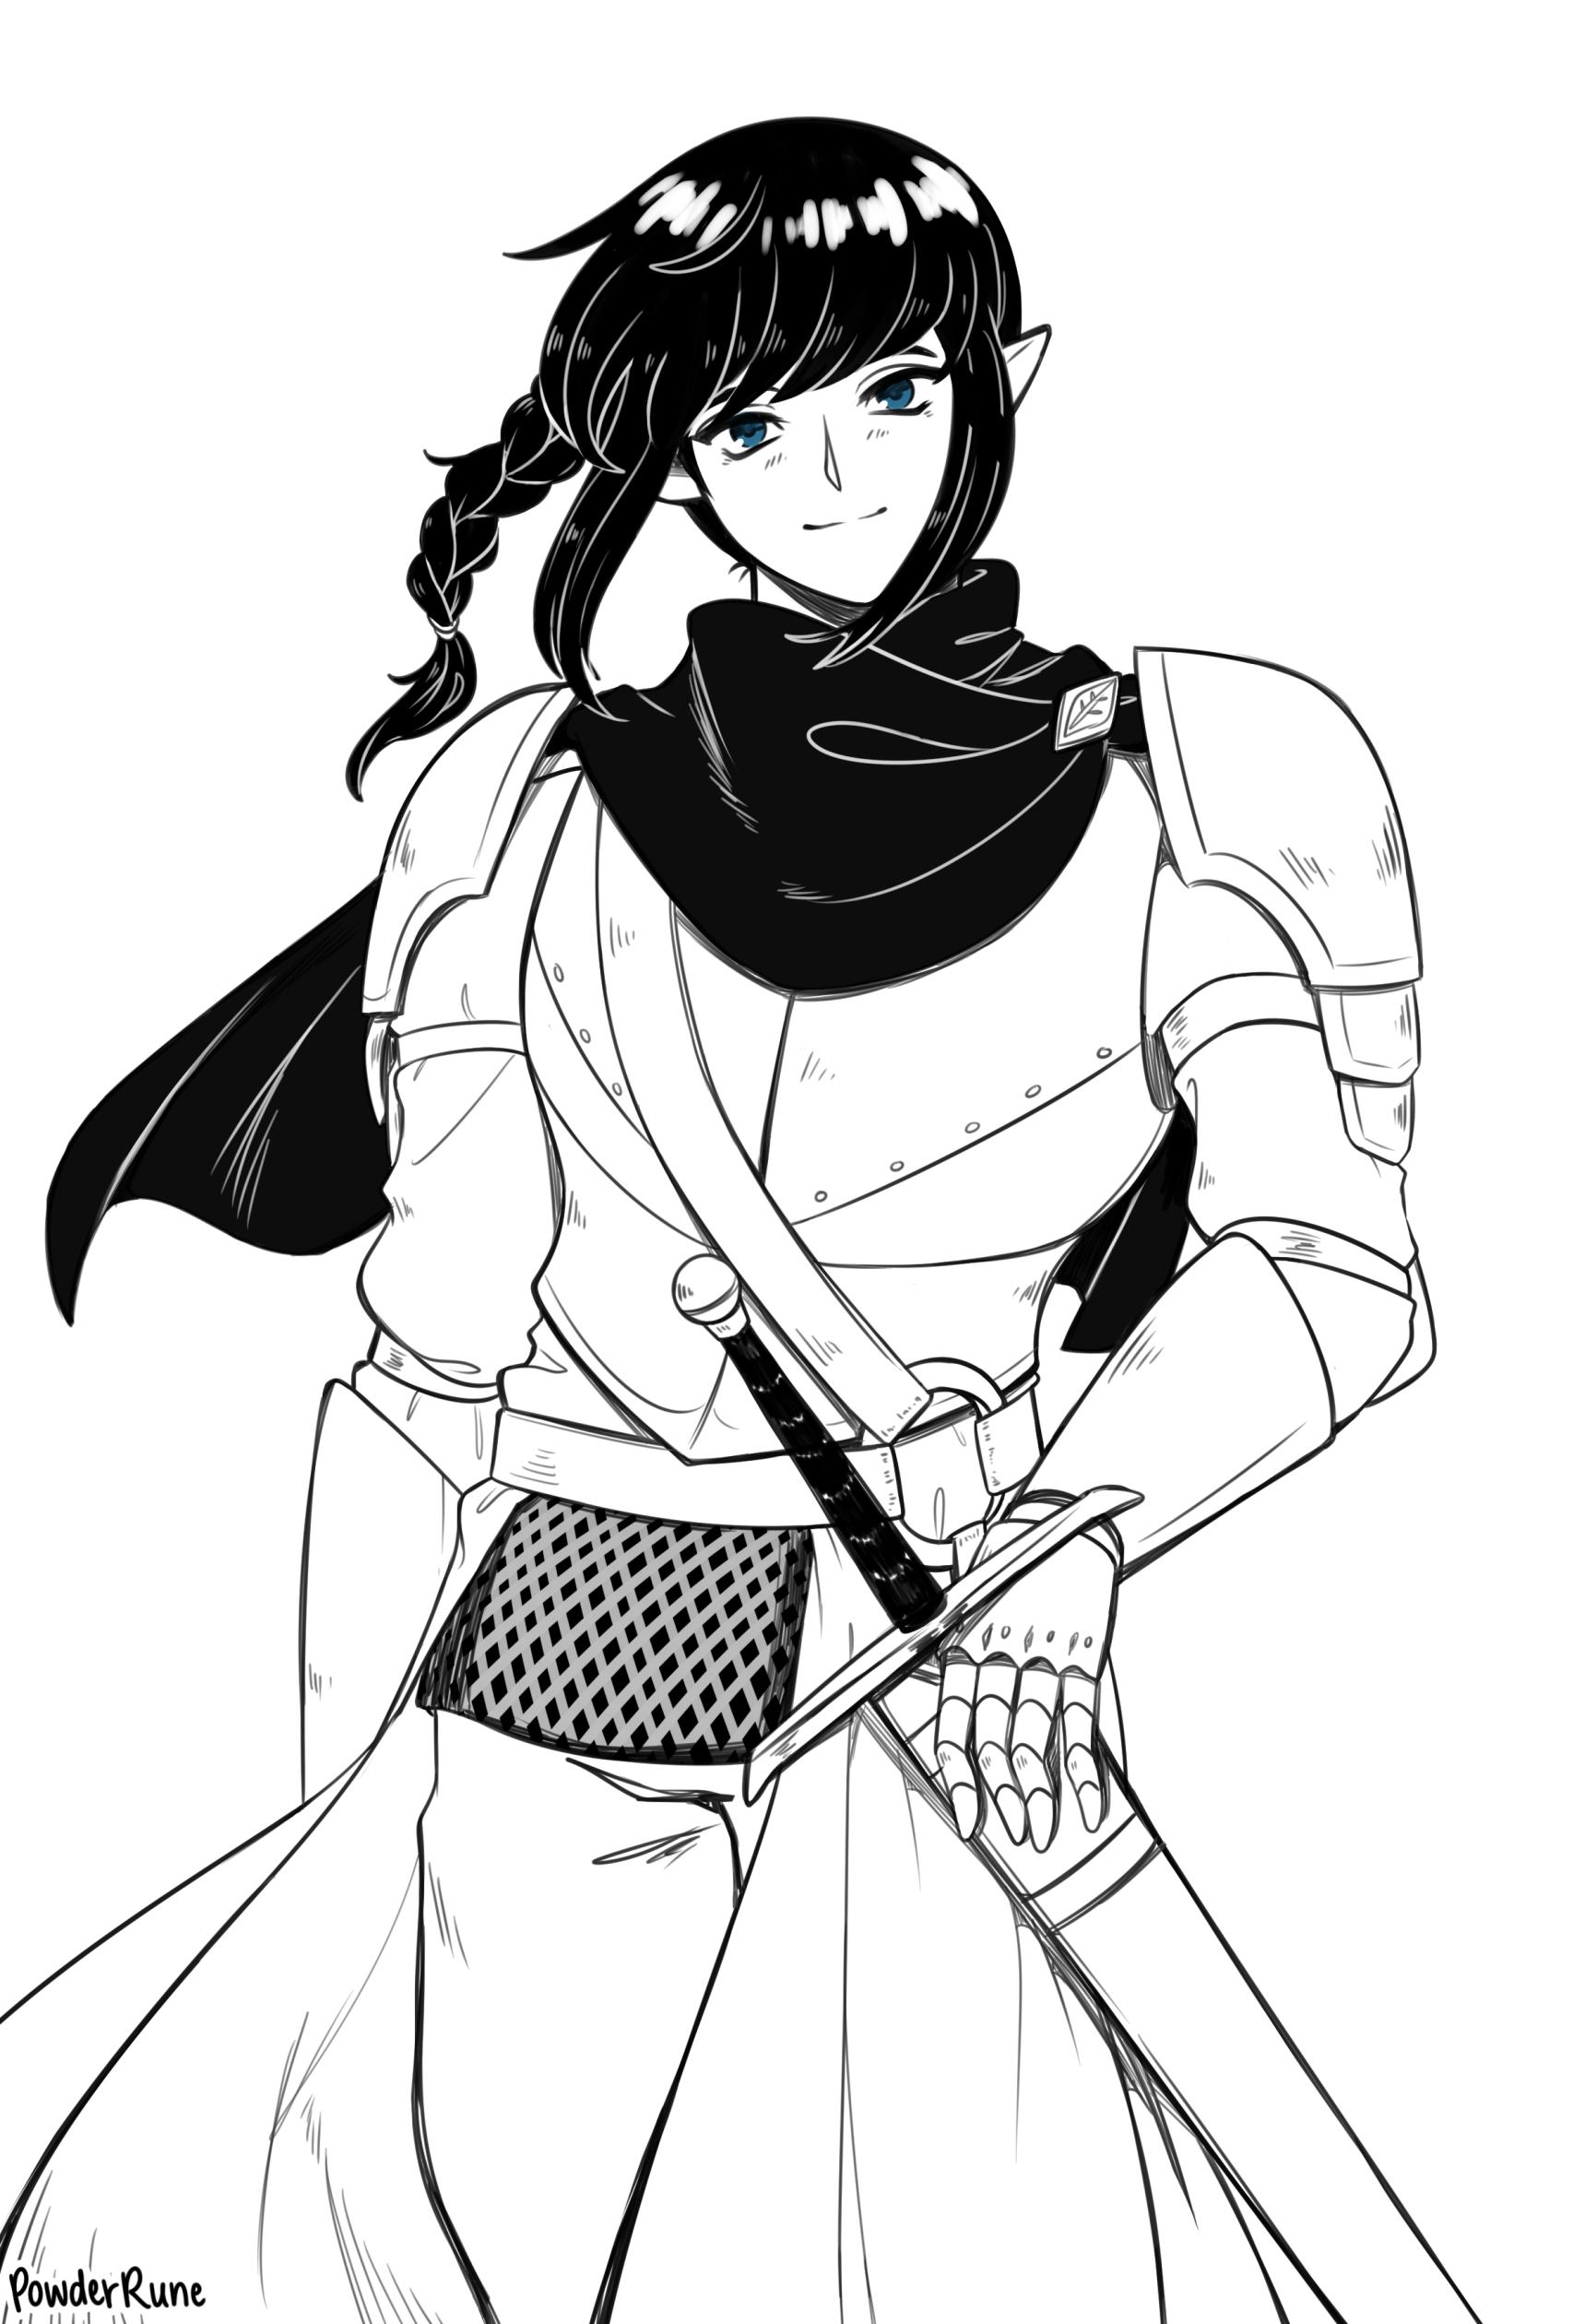 [Commission] Midsummer Knight